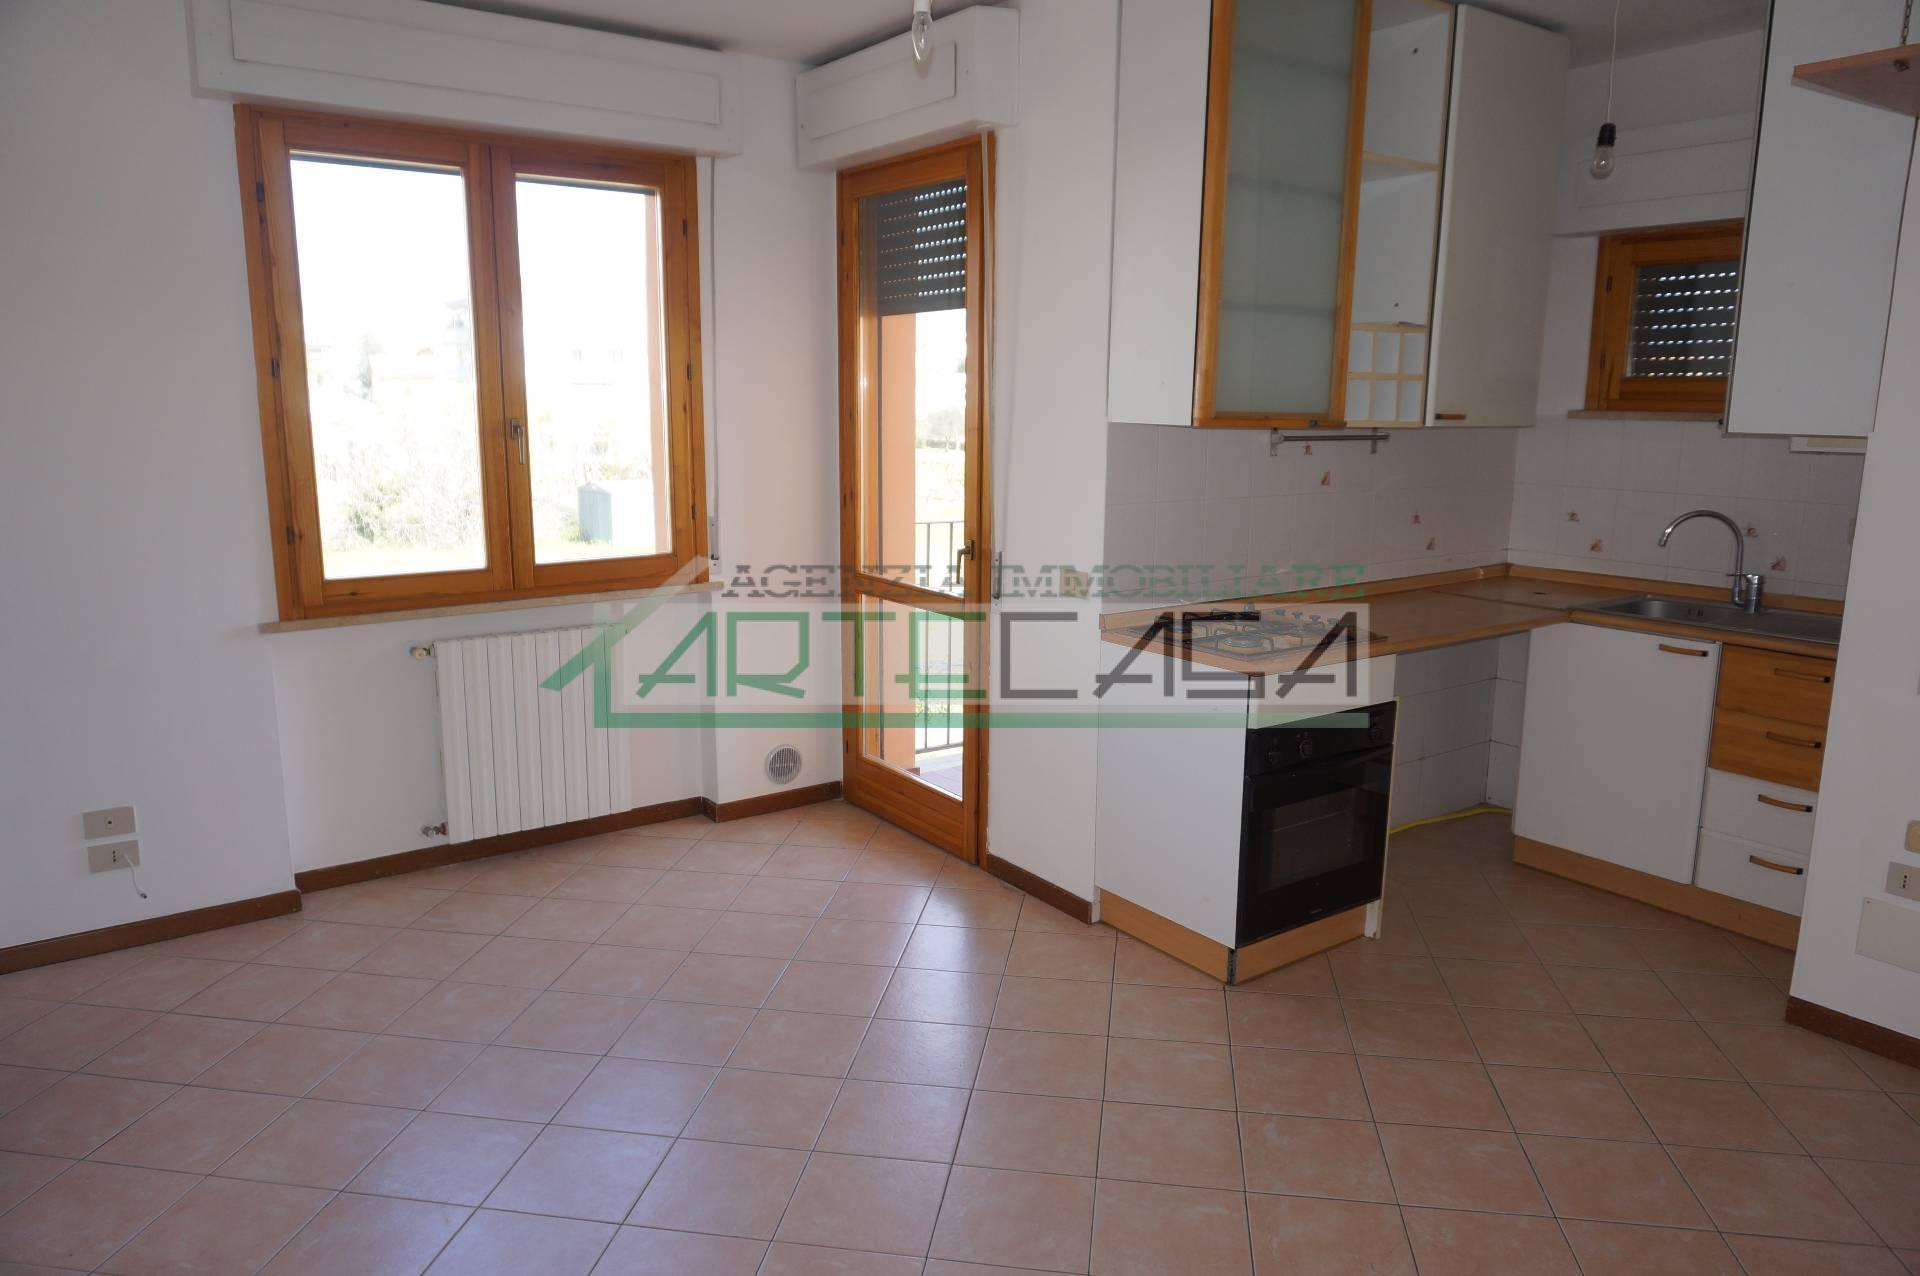 Appartamento in vendita, rif. AC5592